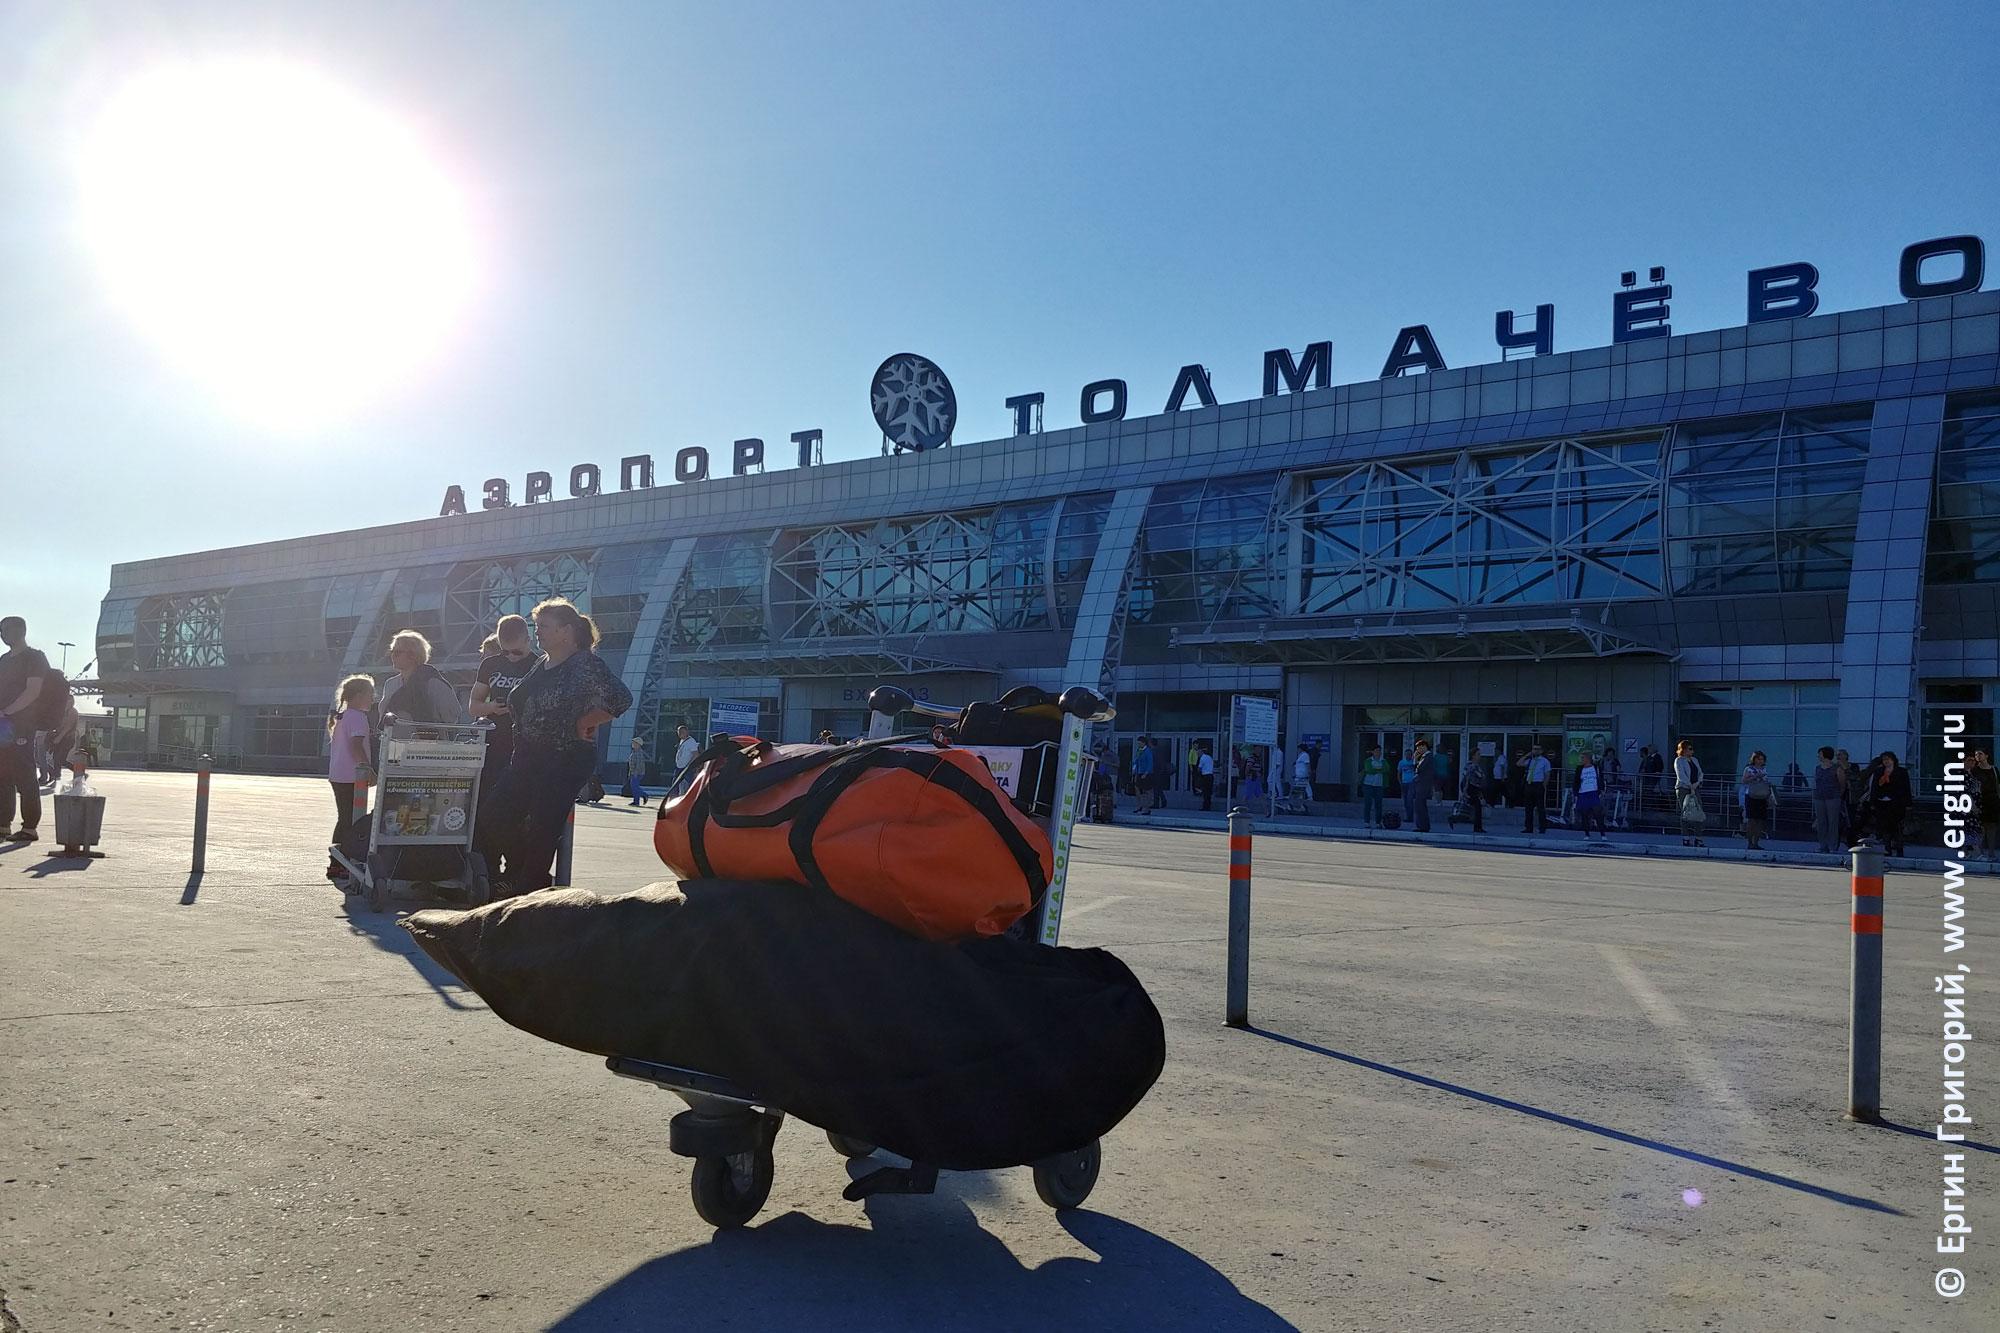 Аэропорт Толмачево солнце и багаж с каяком